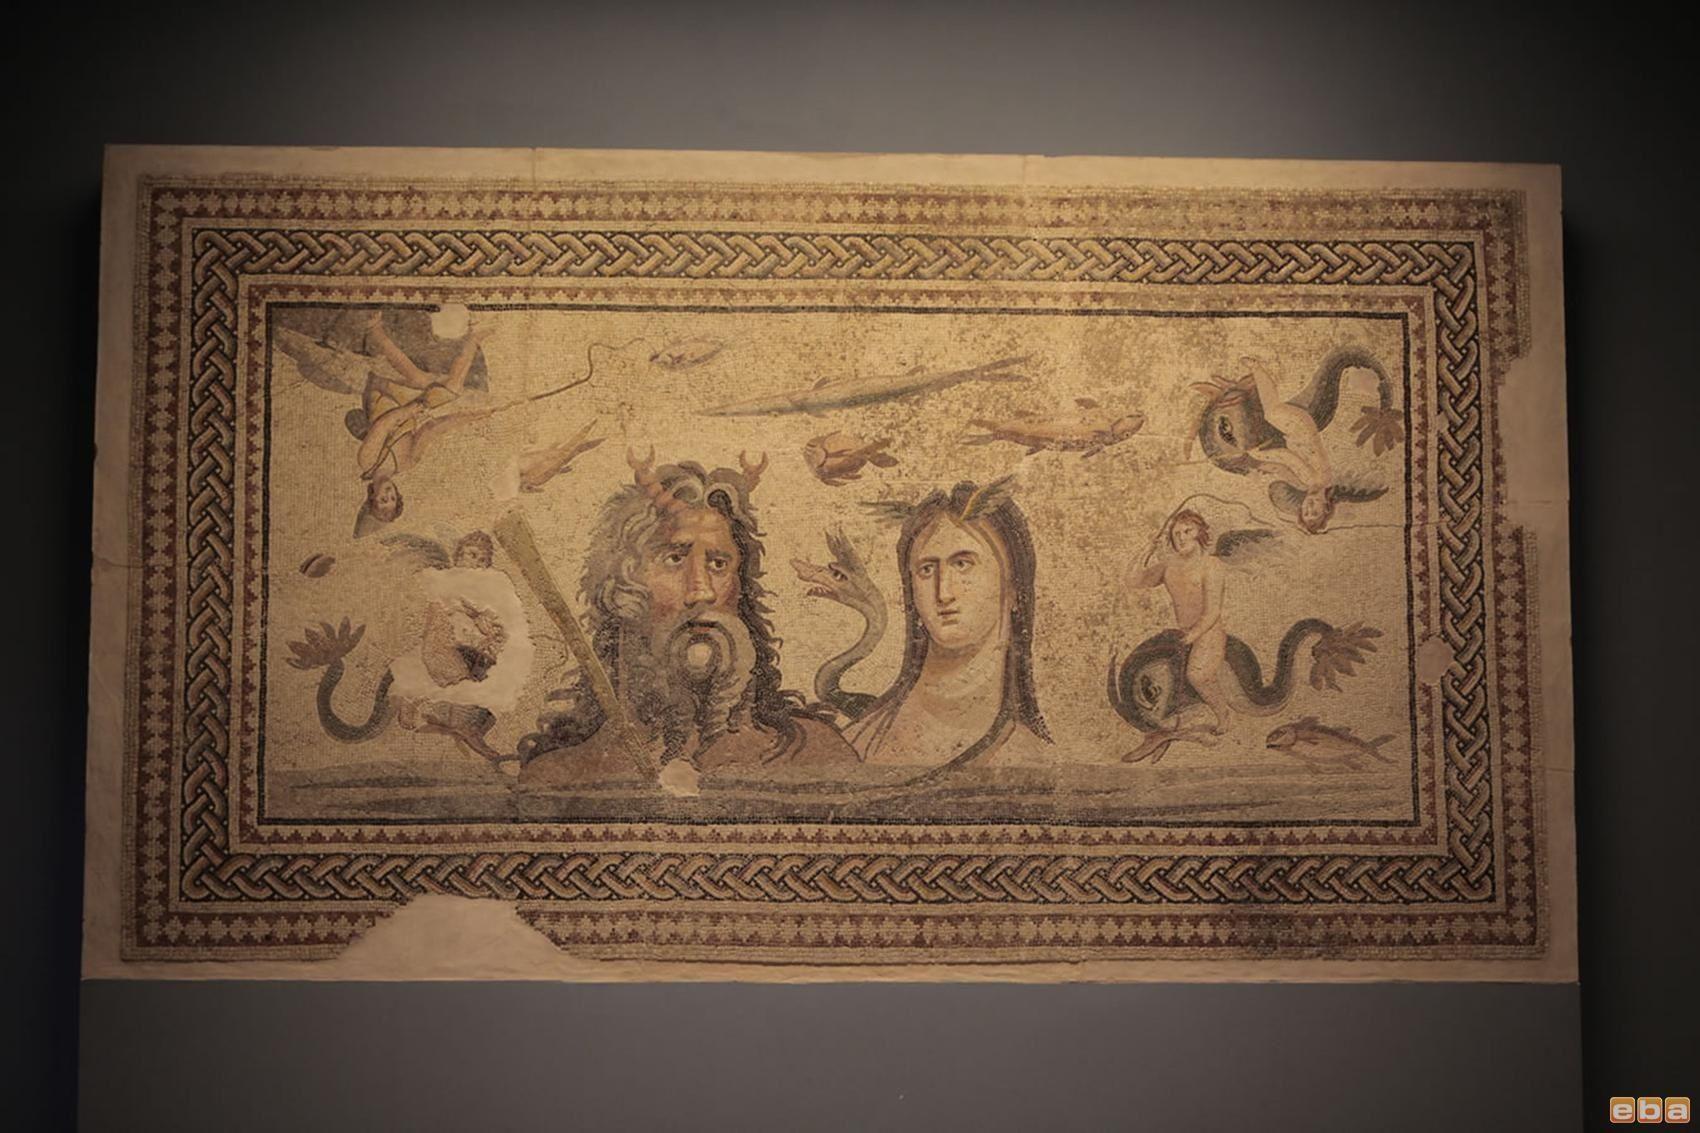 Zeugma Museum, Gaziantep Arkeoloji